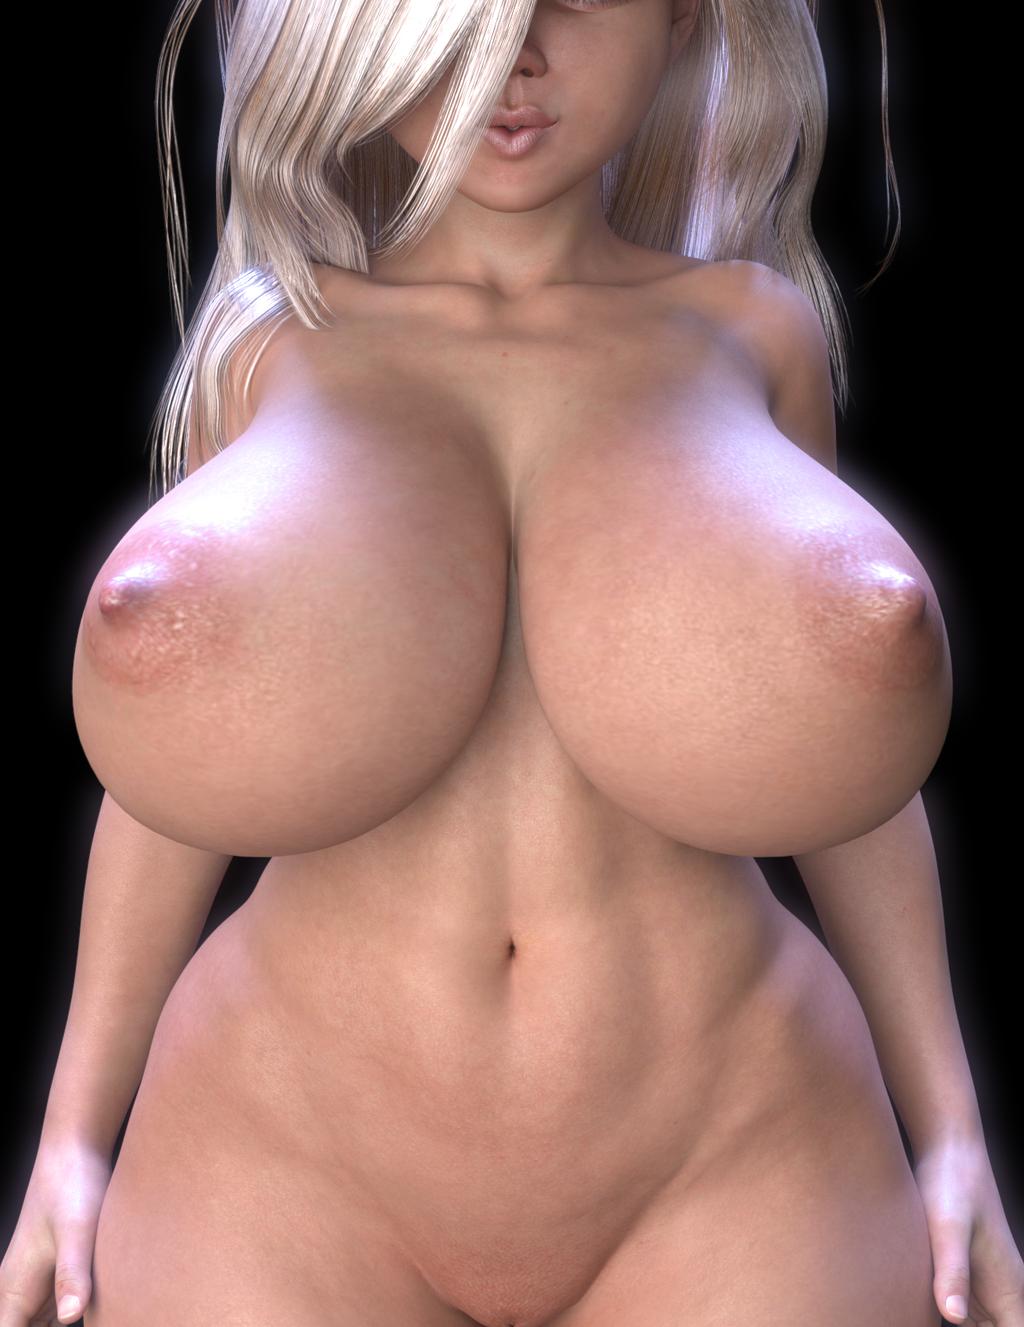 Anus close up butthole